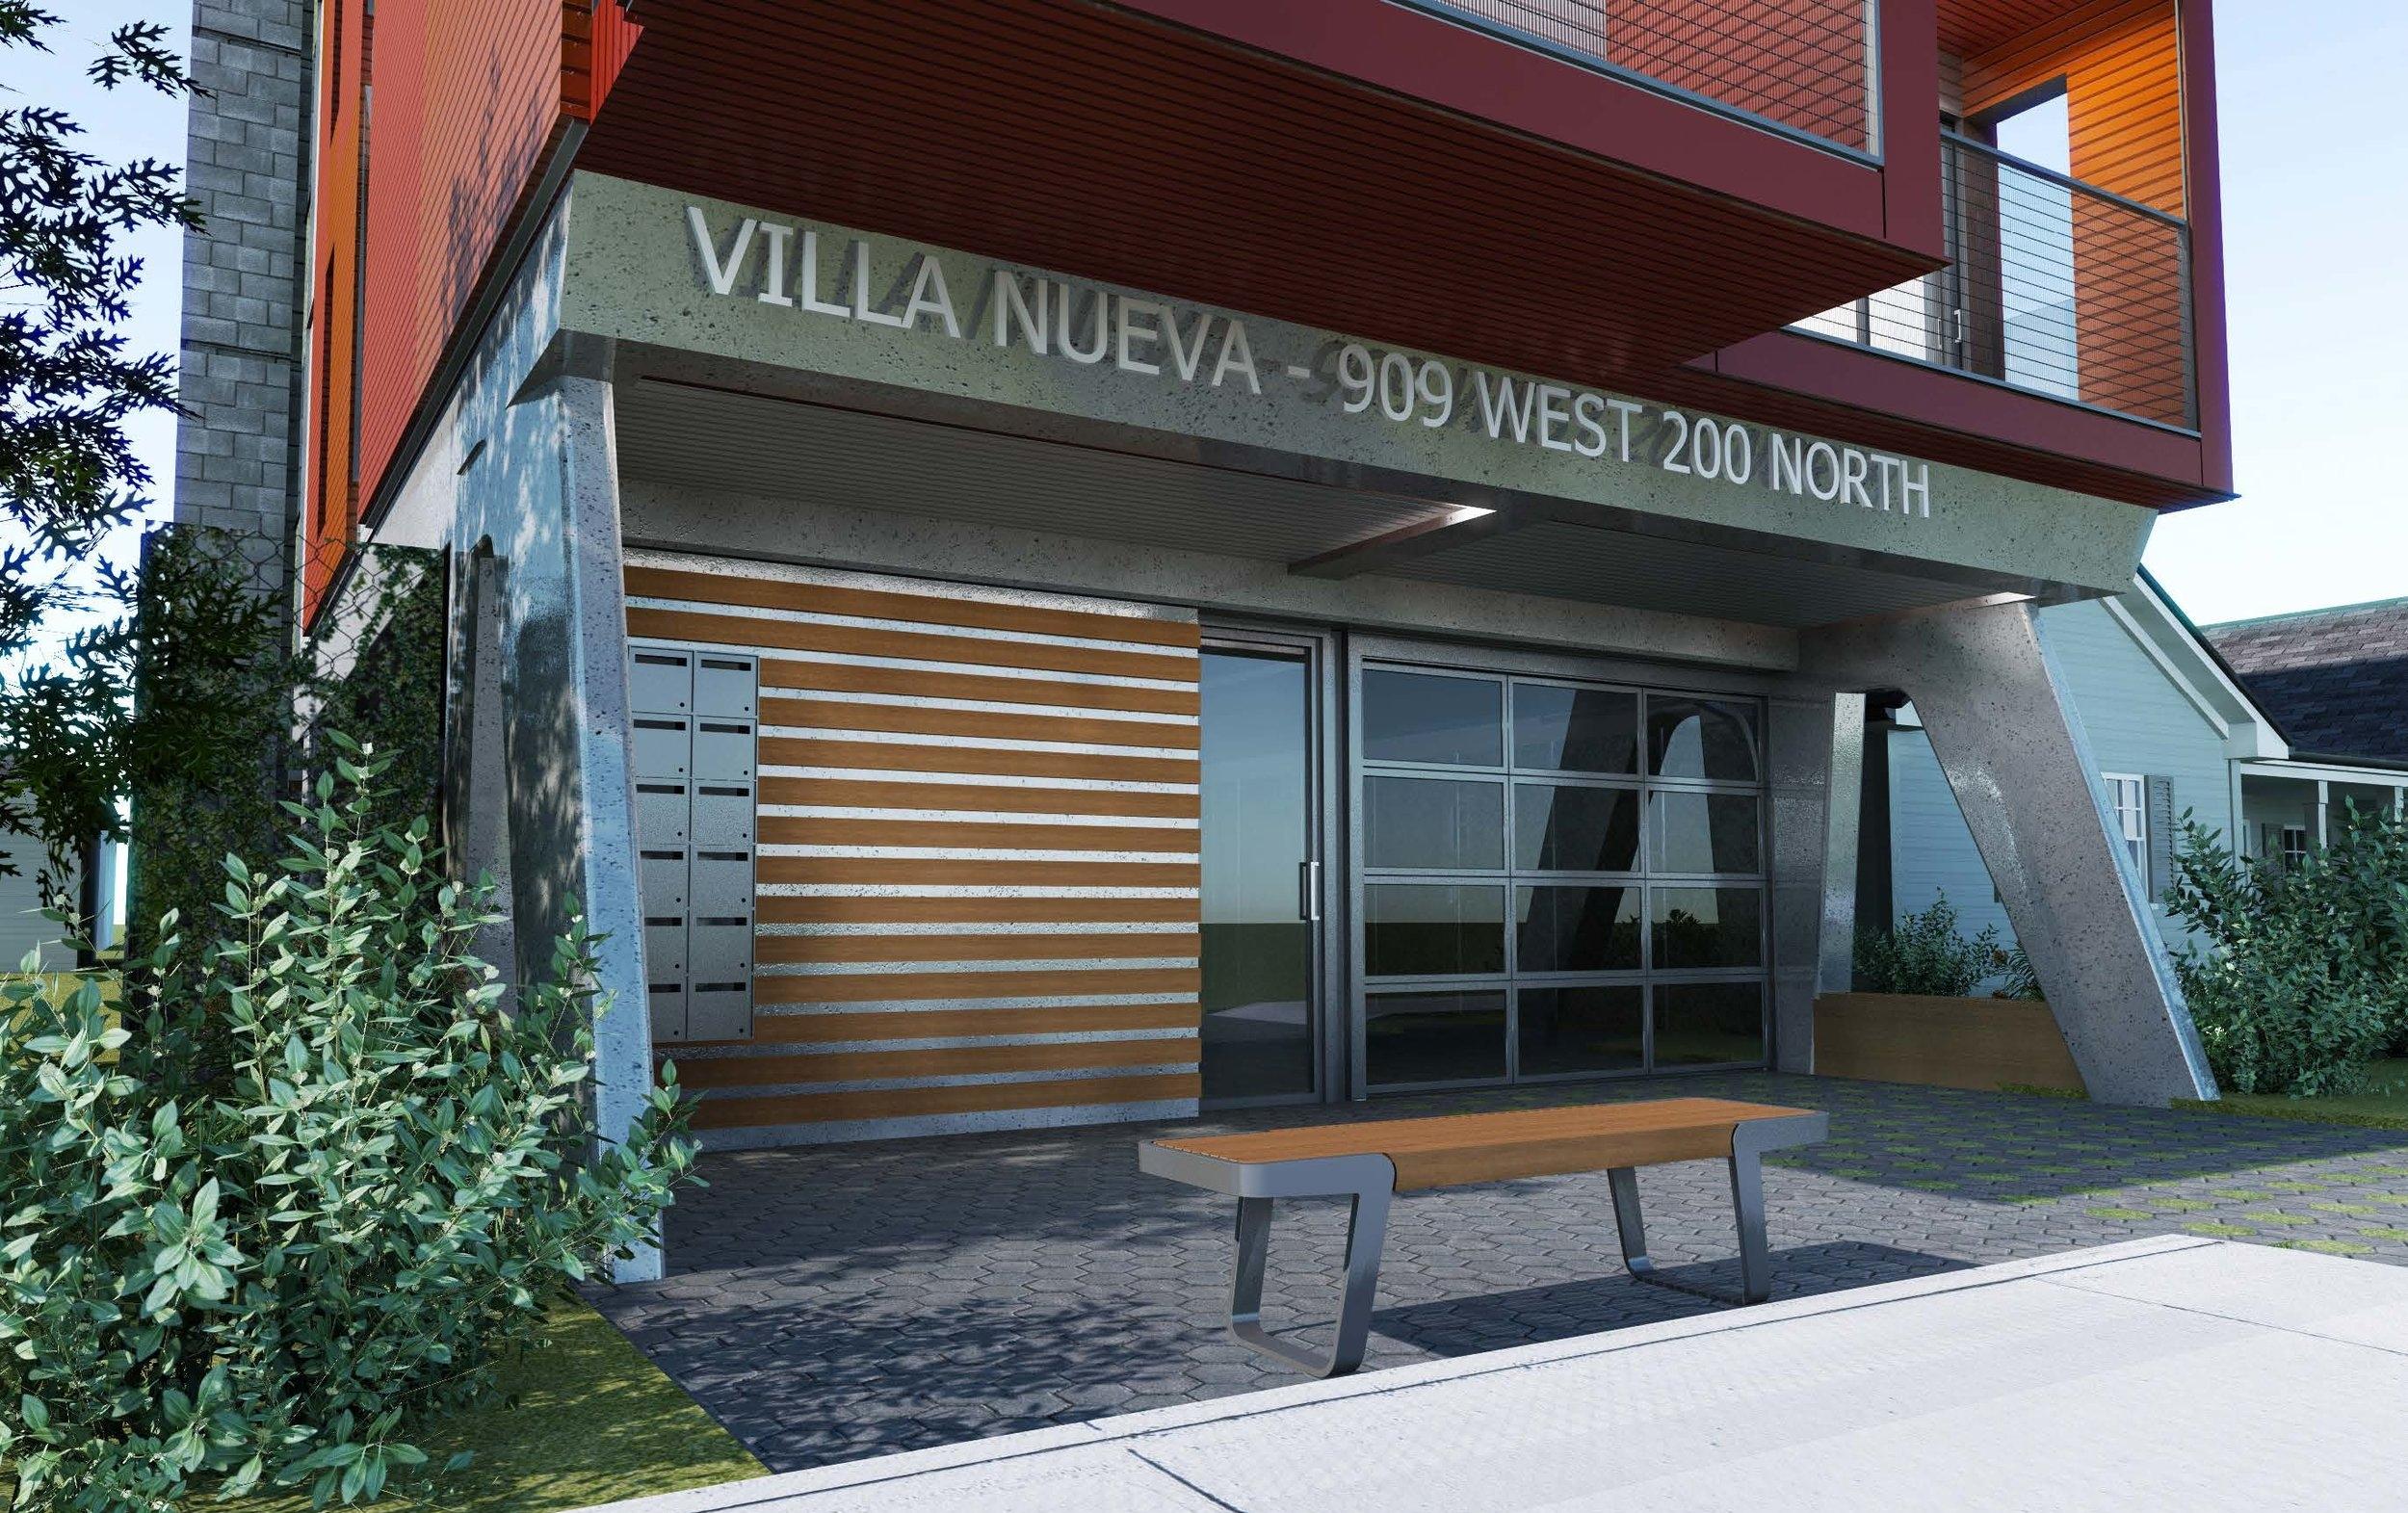 1465_Villa Nueva_4.jpg